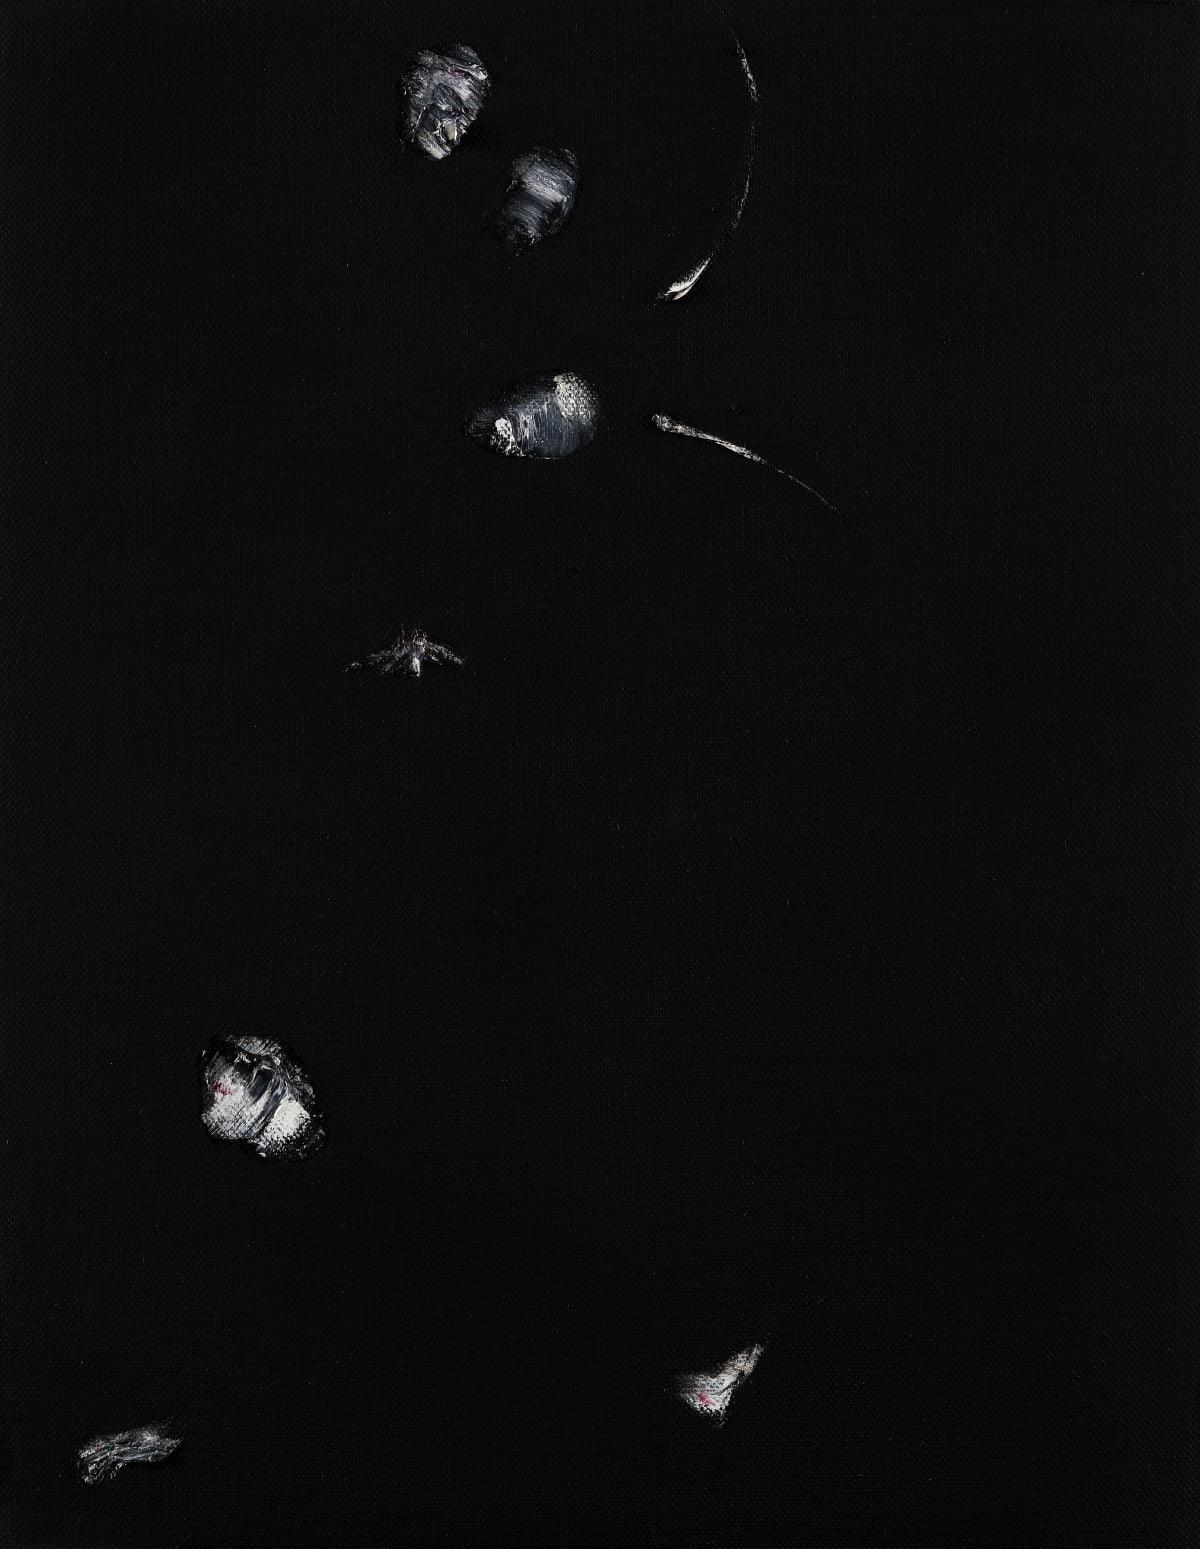 Lorenzo Puglisi La Misericordia II(The Mercy II), 2017 Oil on canvas. 45 x 35 x 7 cm (17.7 x 13.8 x 2.75 in)